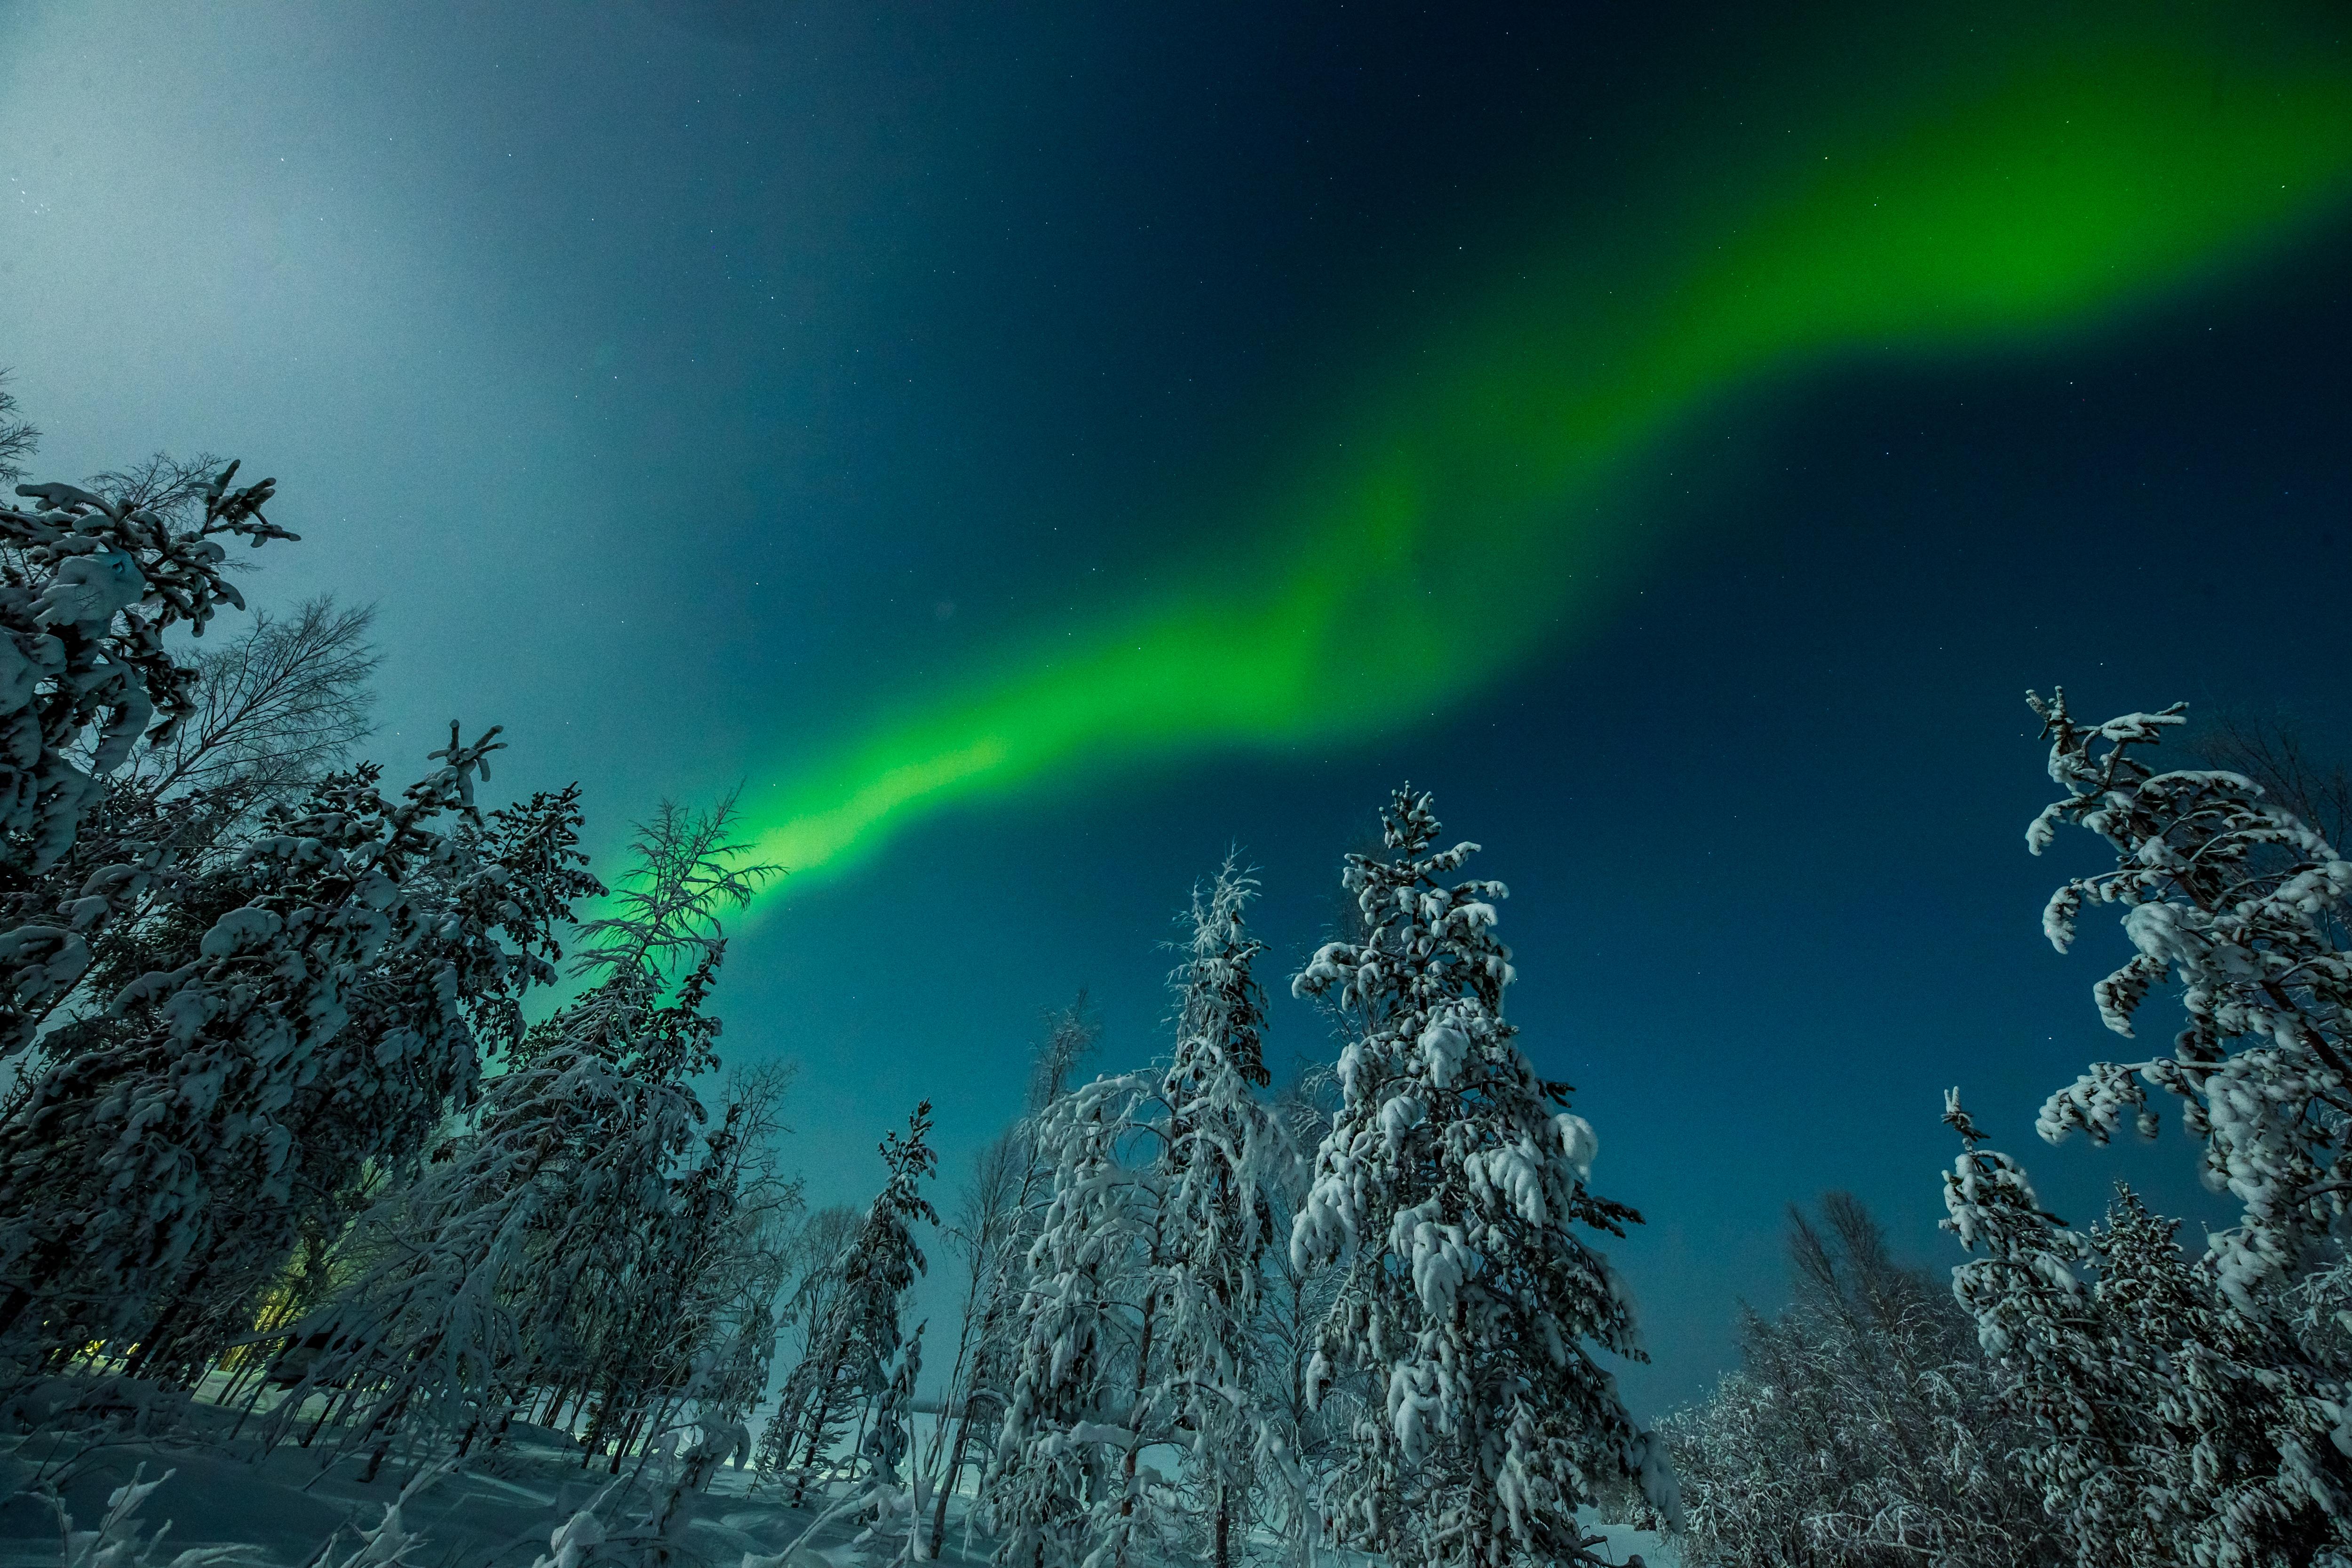 Aurora Borealis, or Northern Lights